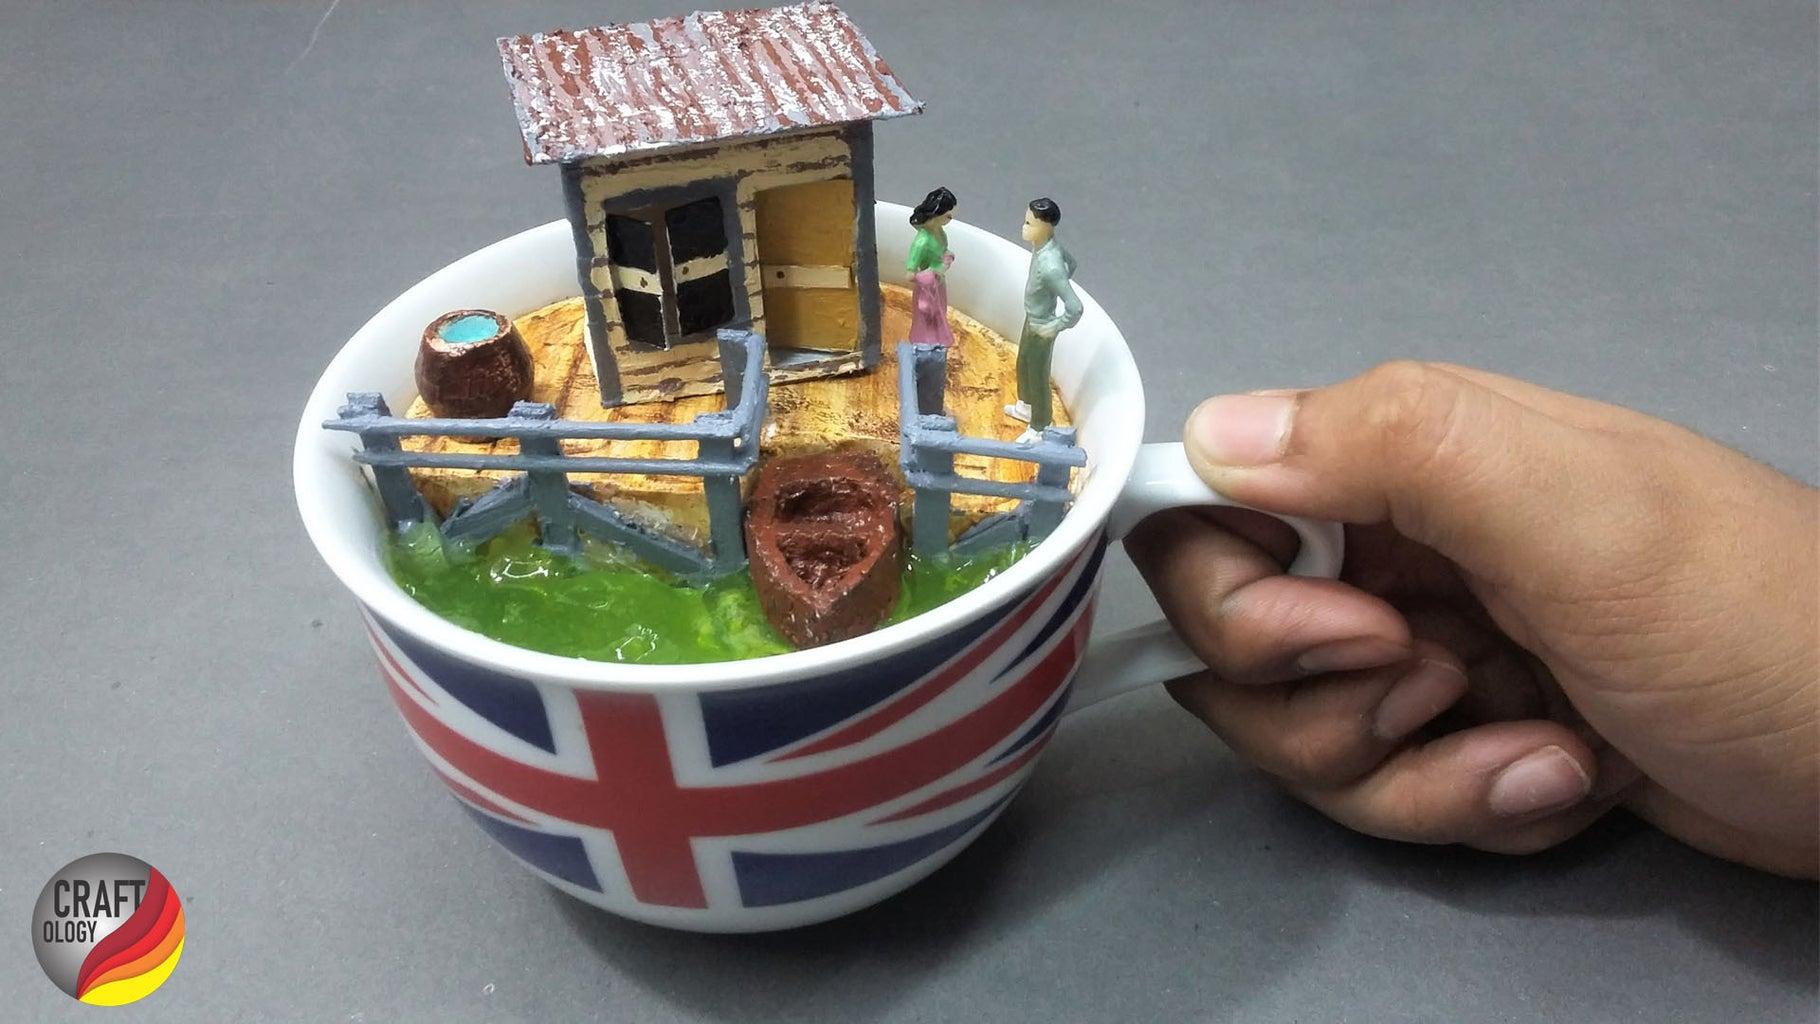 How to Make DIY Miniature Art|Landscape Realistic Cup Diorama